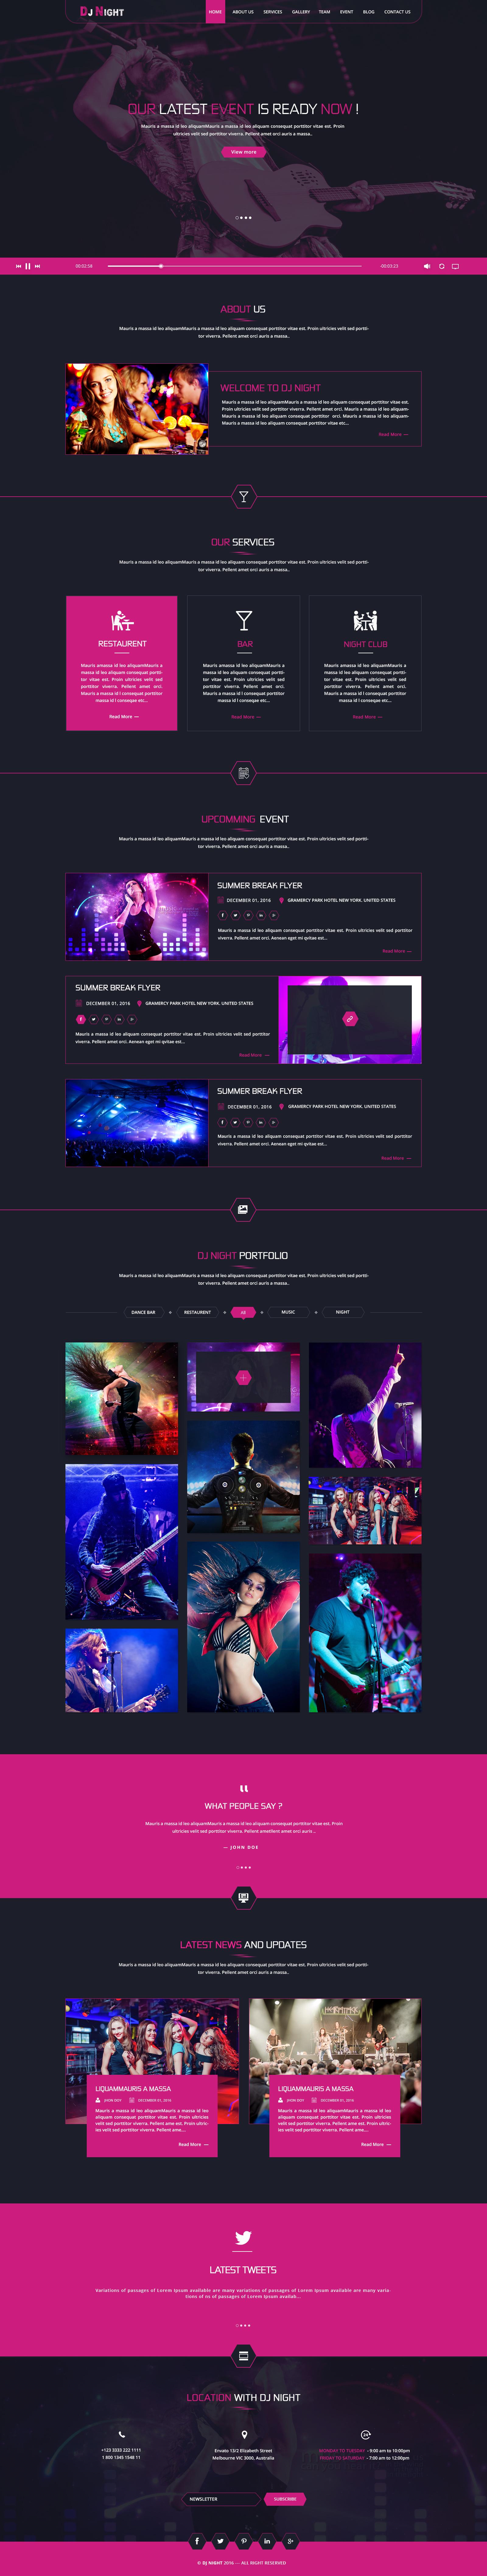 DJ Night - Event, DJ, Party, Music Club HTML Template by Teqbees ...